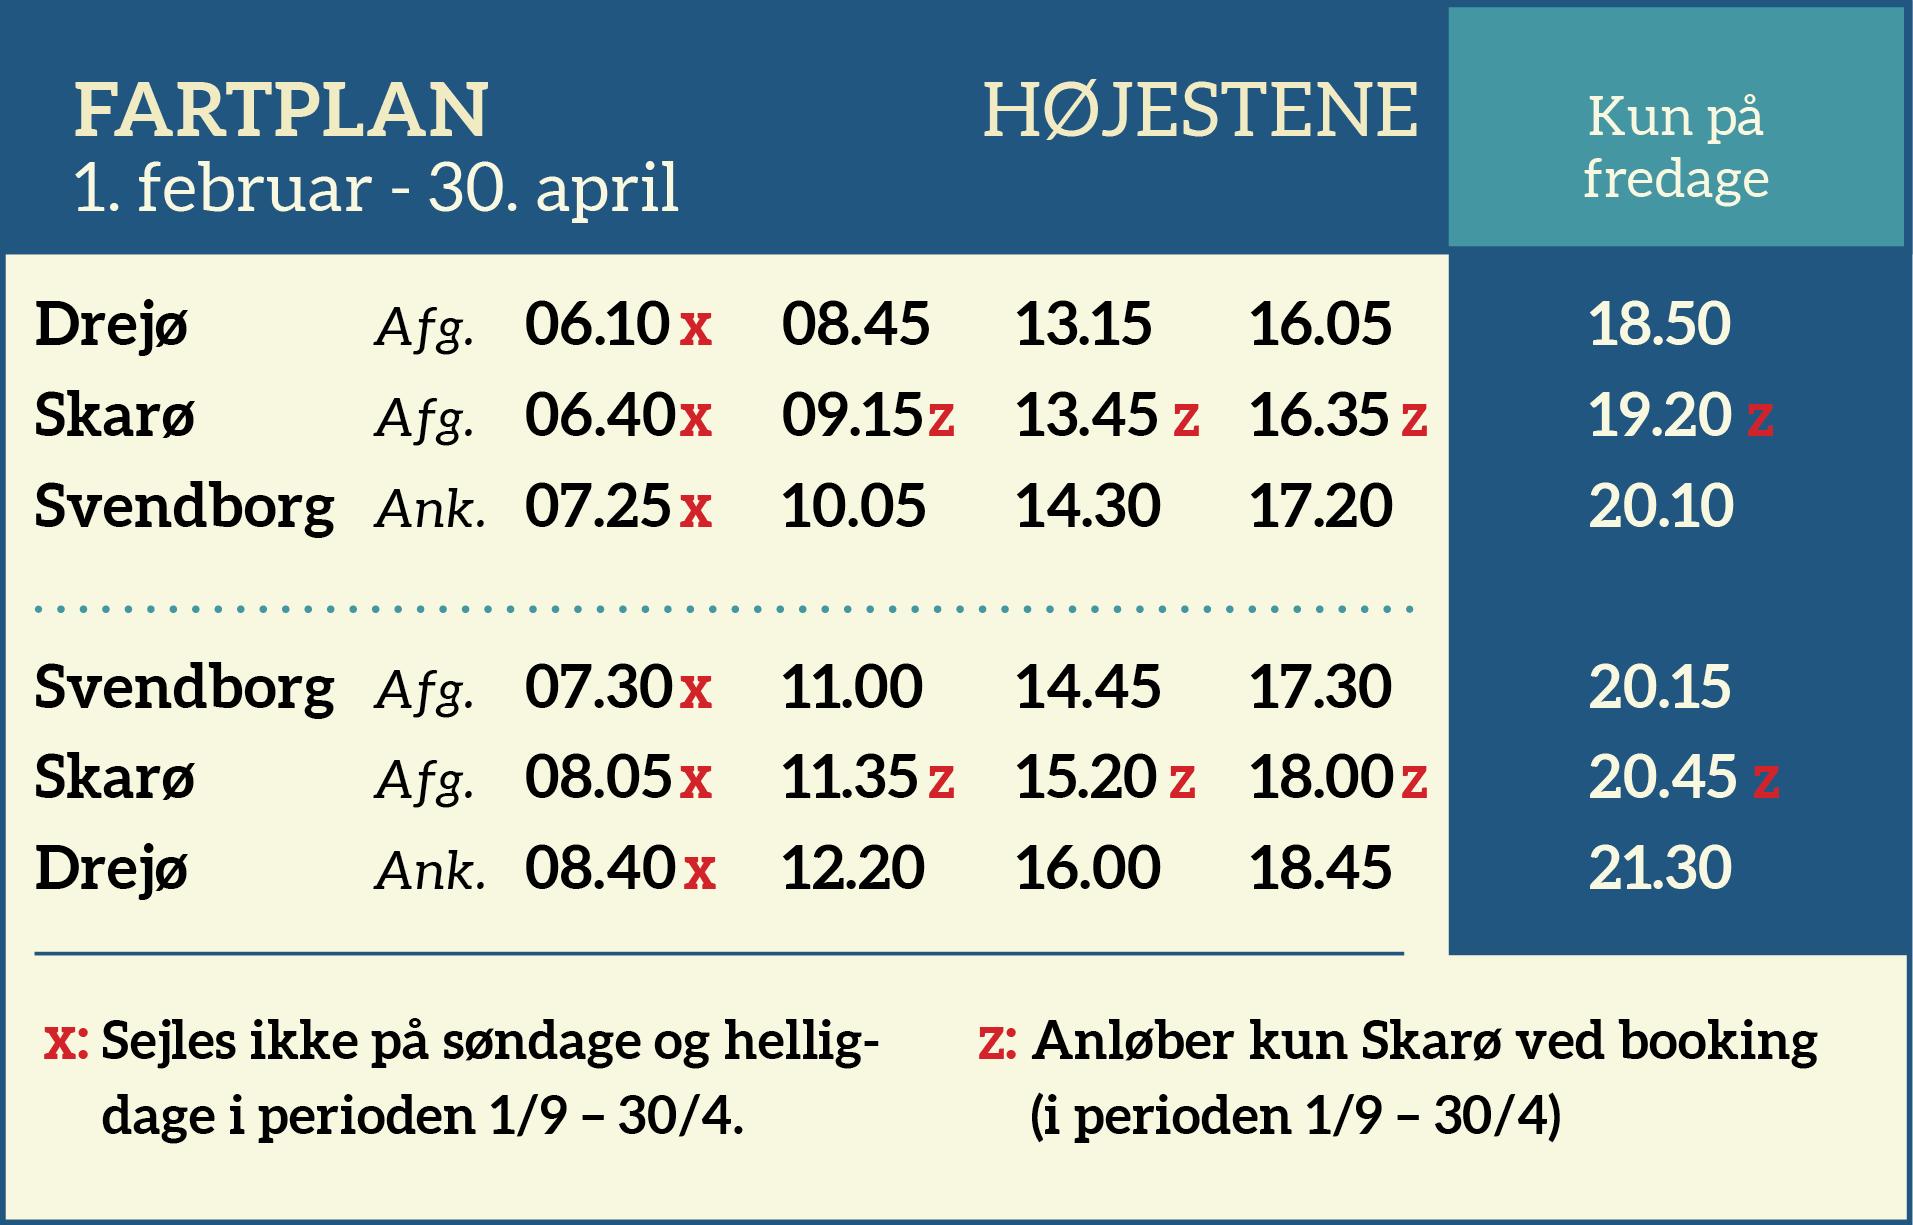 Fartplan 0102-3004